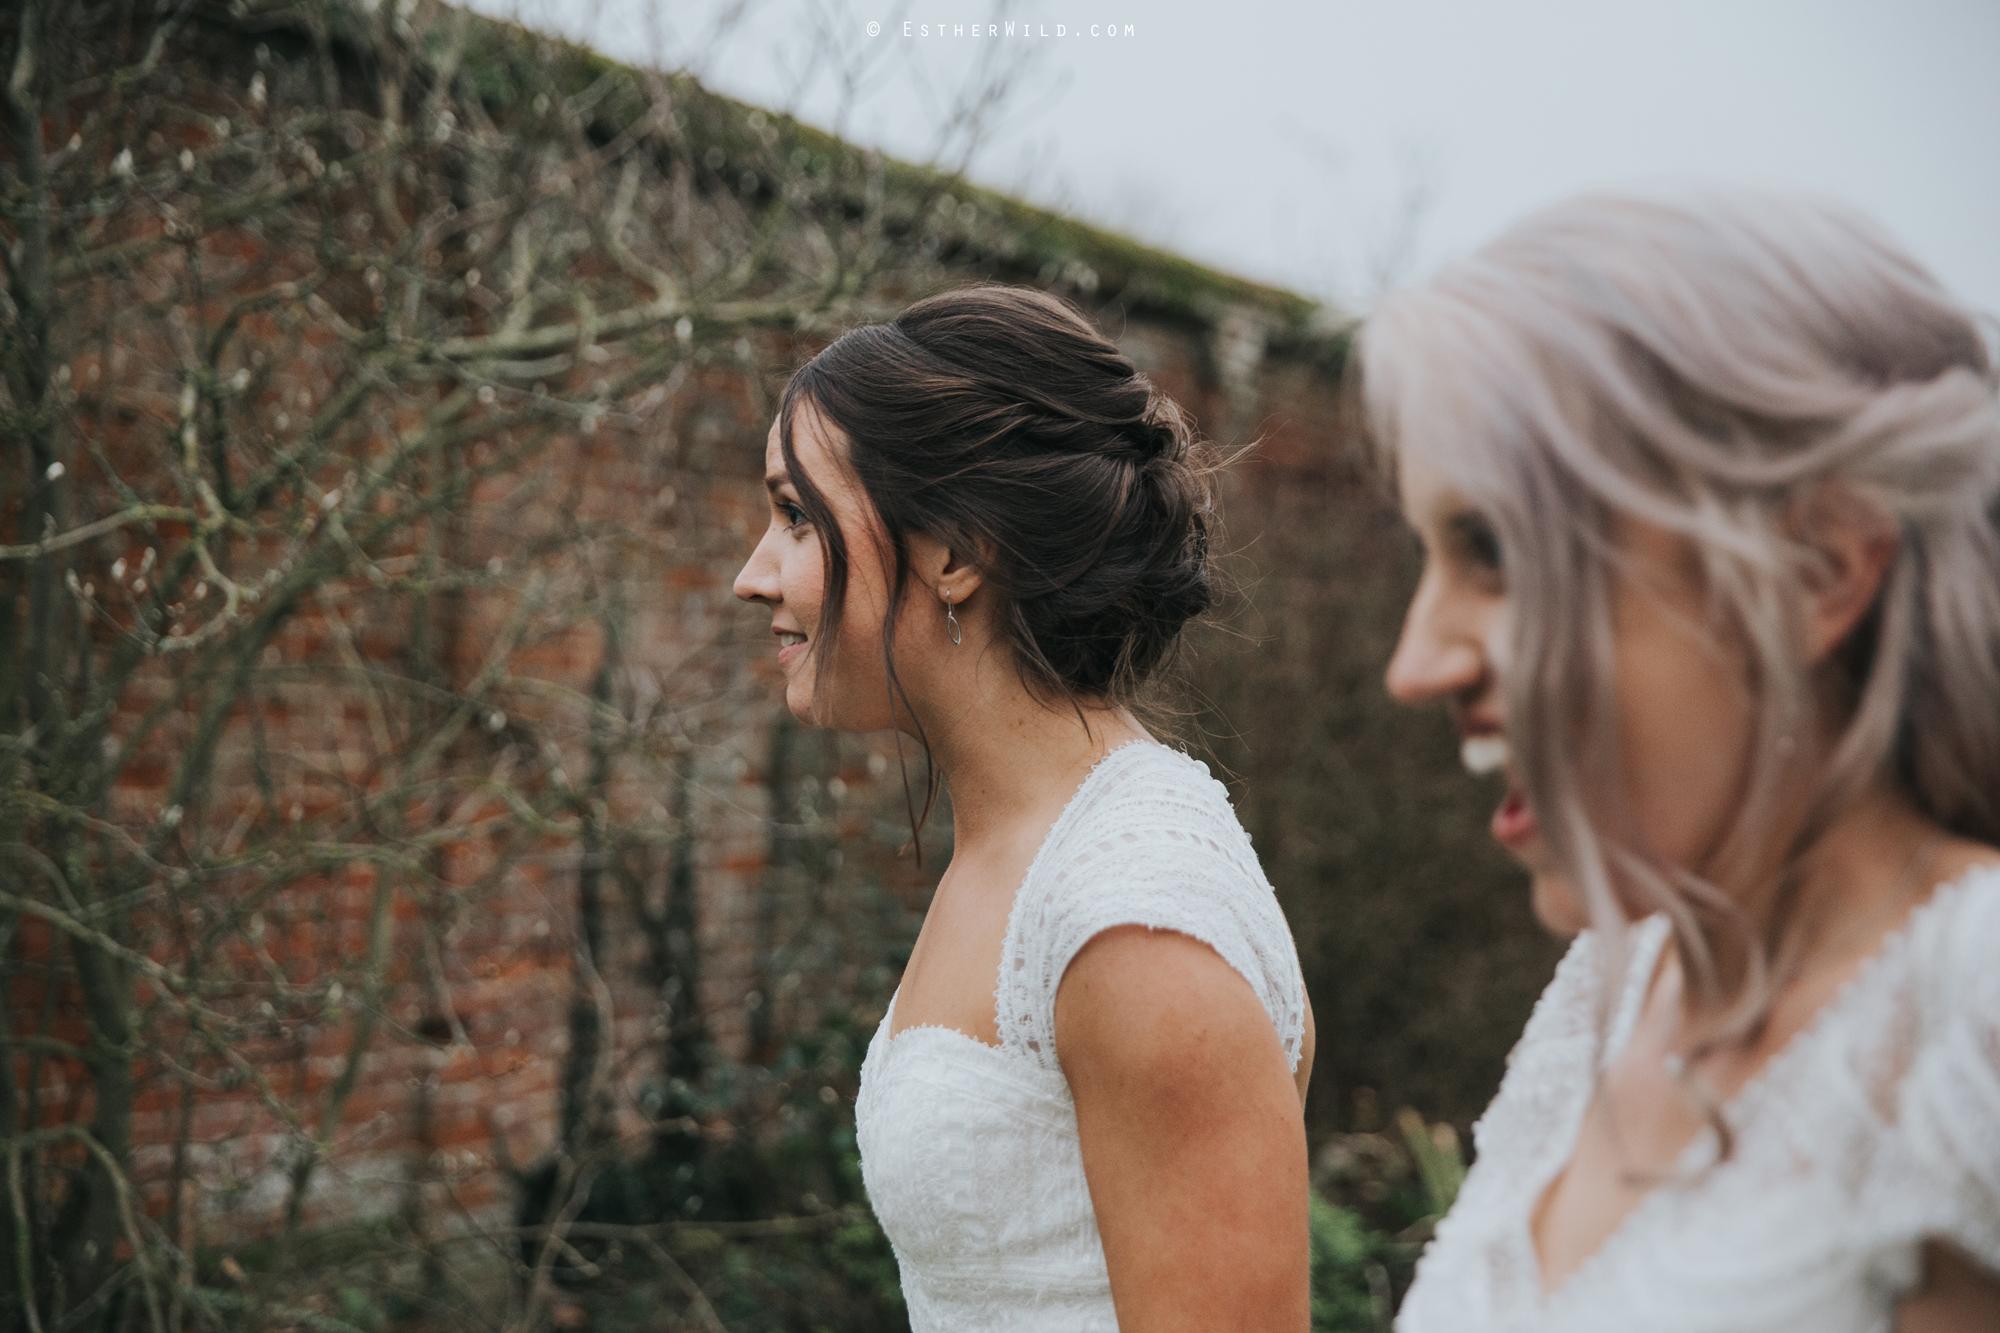 Elms_Barn_Weddings_Suffolk_Photographer_Copyright_Esther_Wild_IMG_2063.jpg